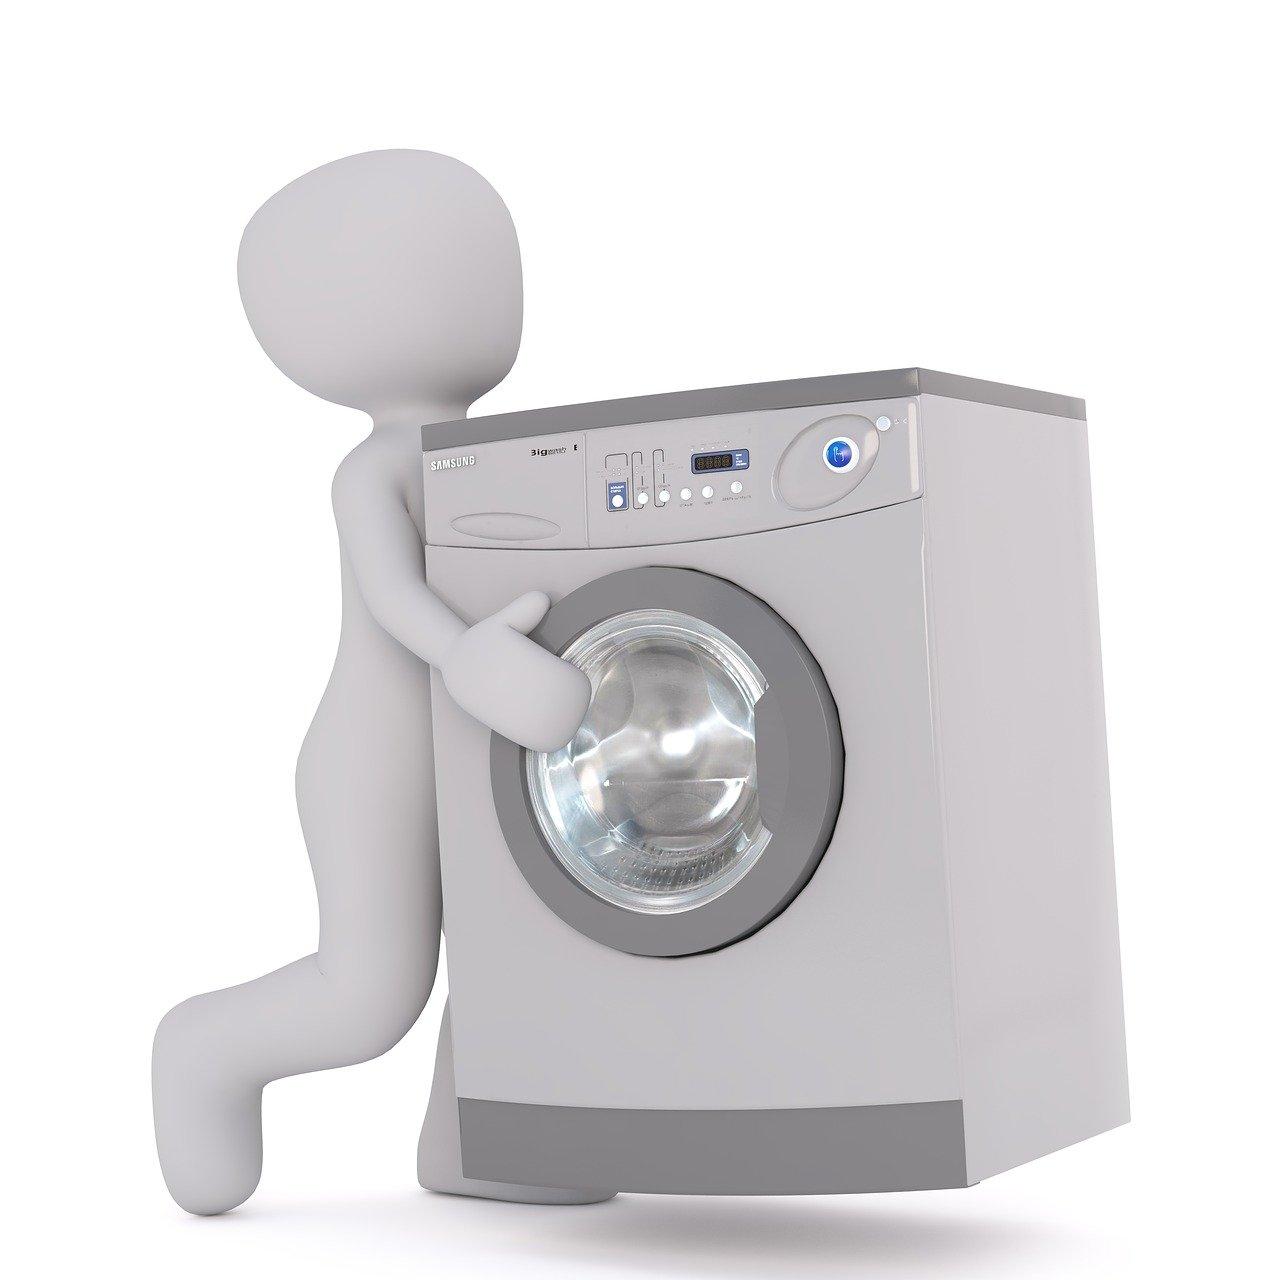 "washing-machine-חשמל עודפים | תמונה להמחשה PIXABAY | סקירה ""דוסיז צרכנות מקומית"""